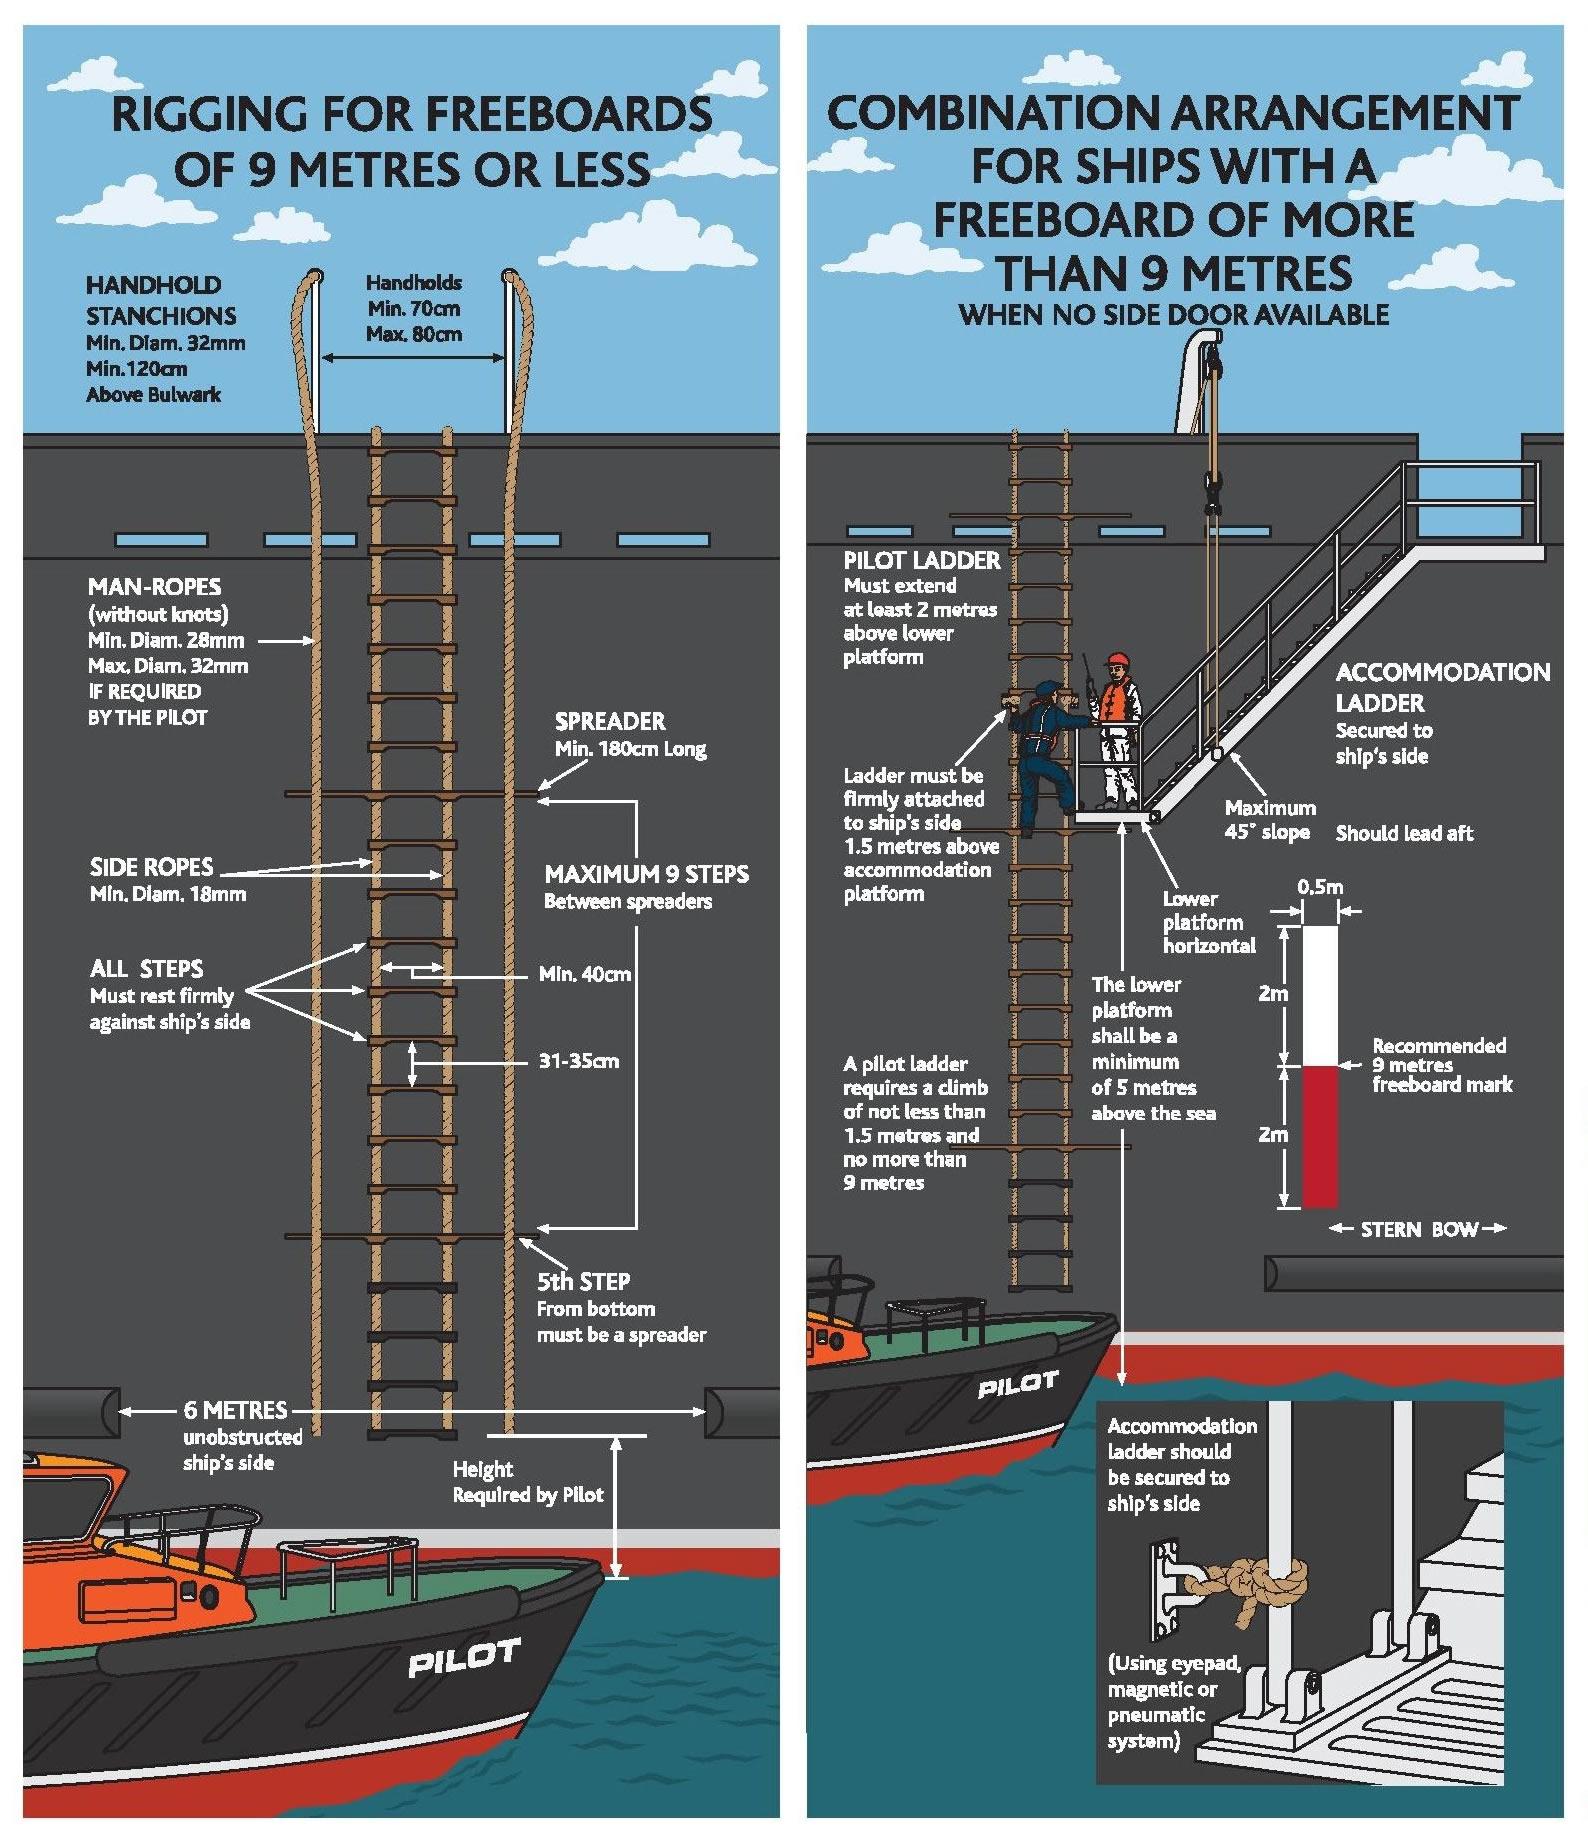 Pilot Ladder Regulation ISO799-2004